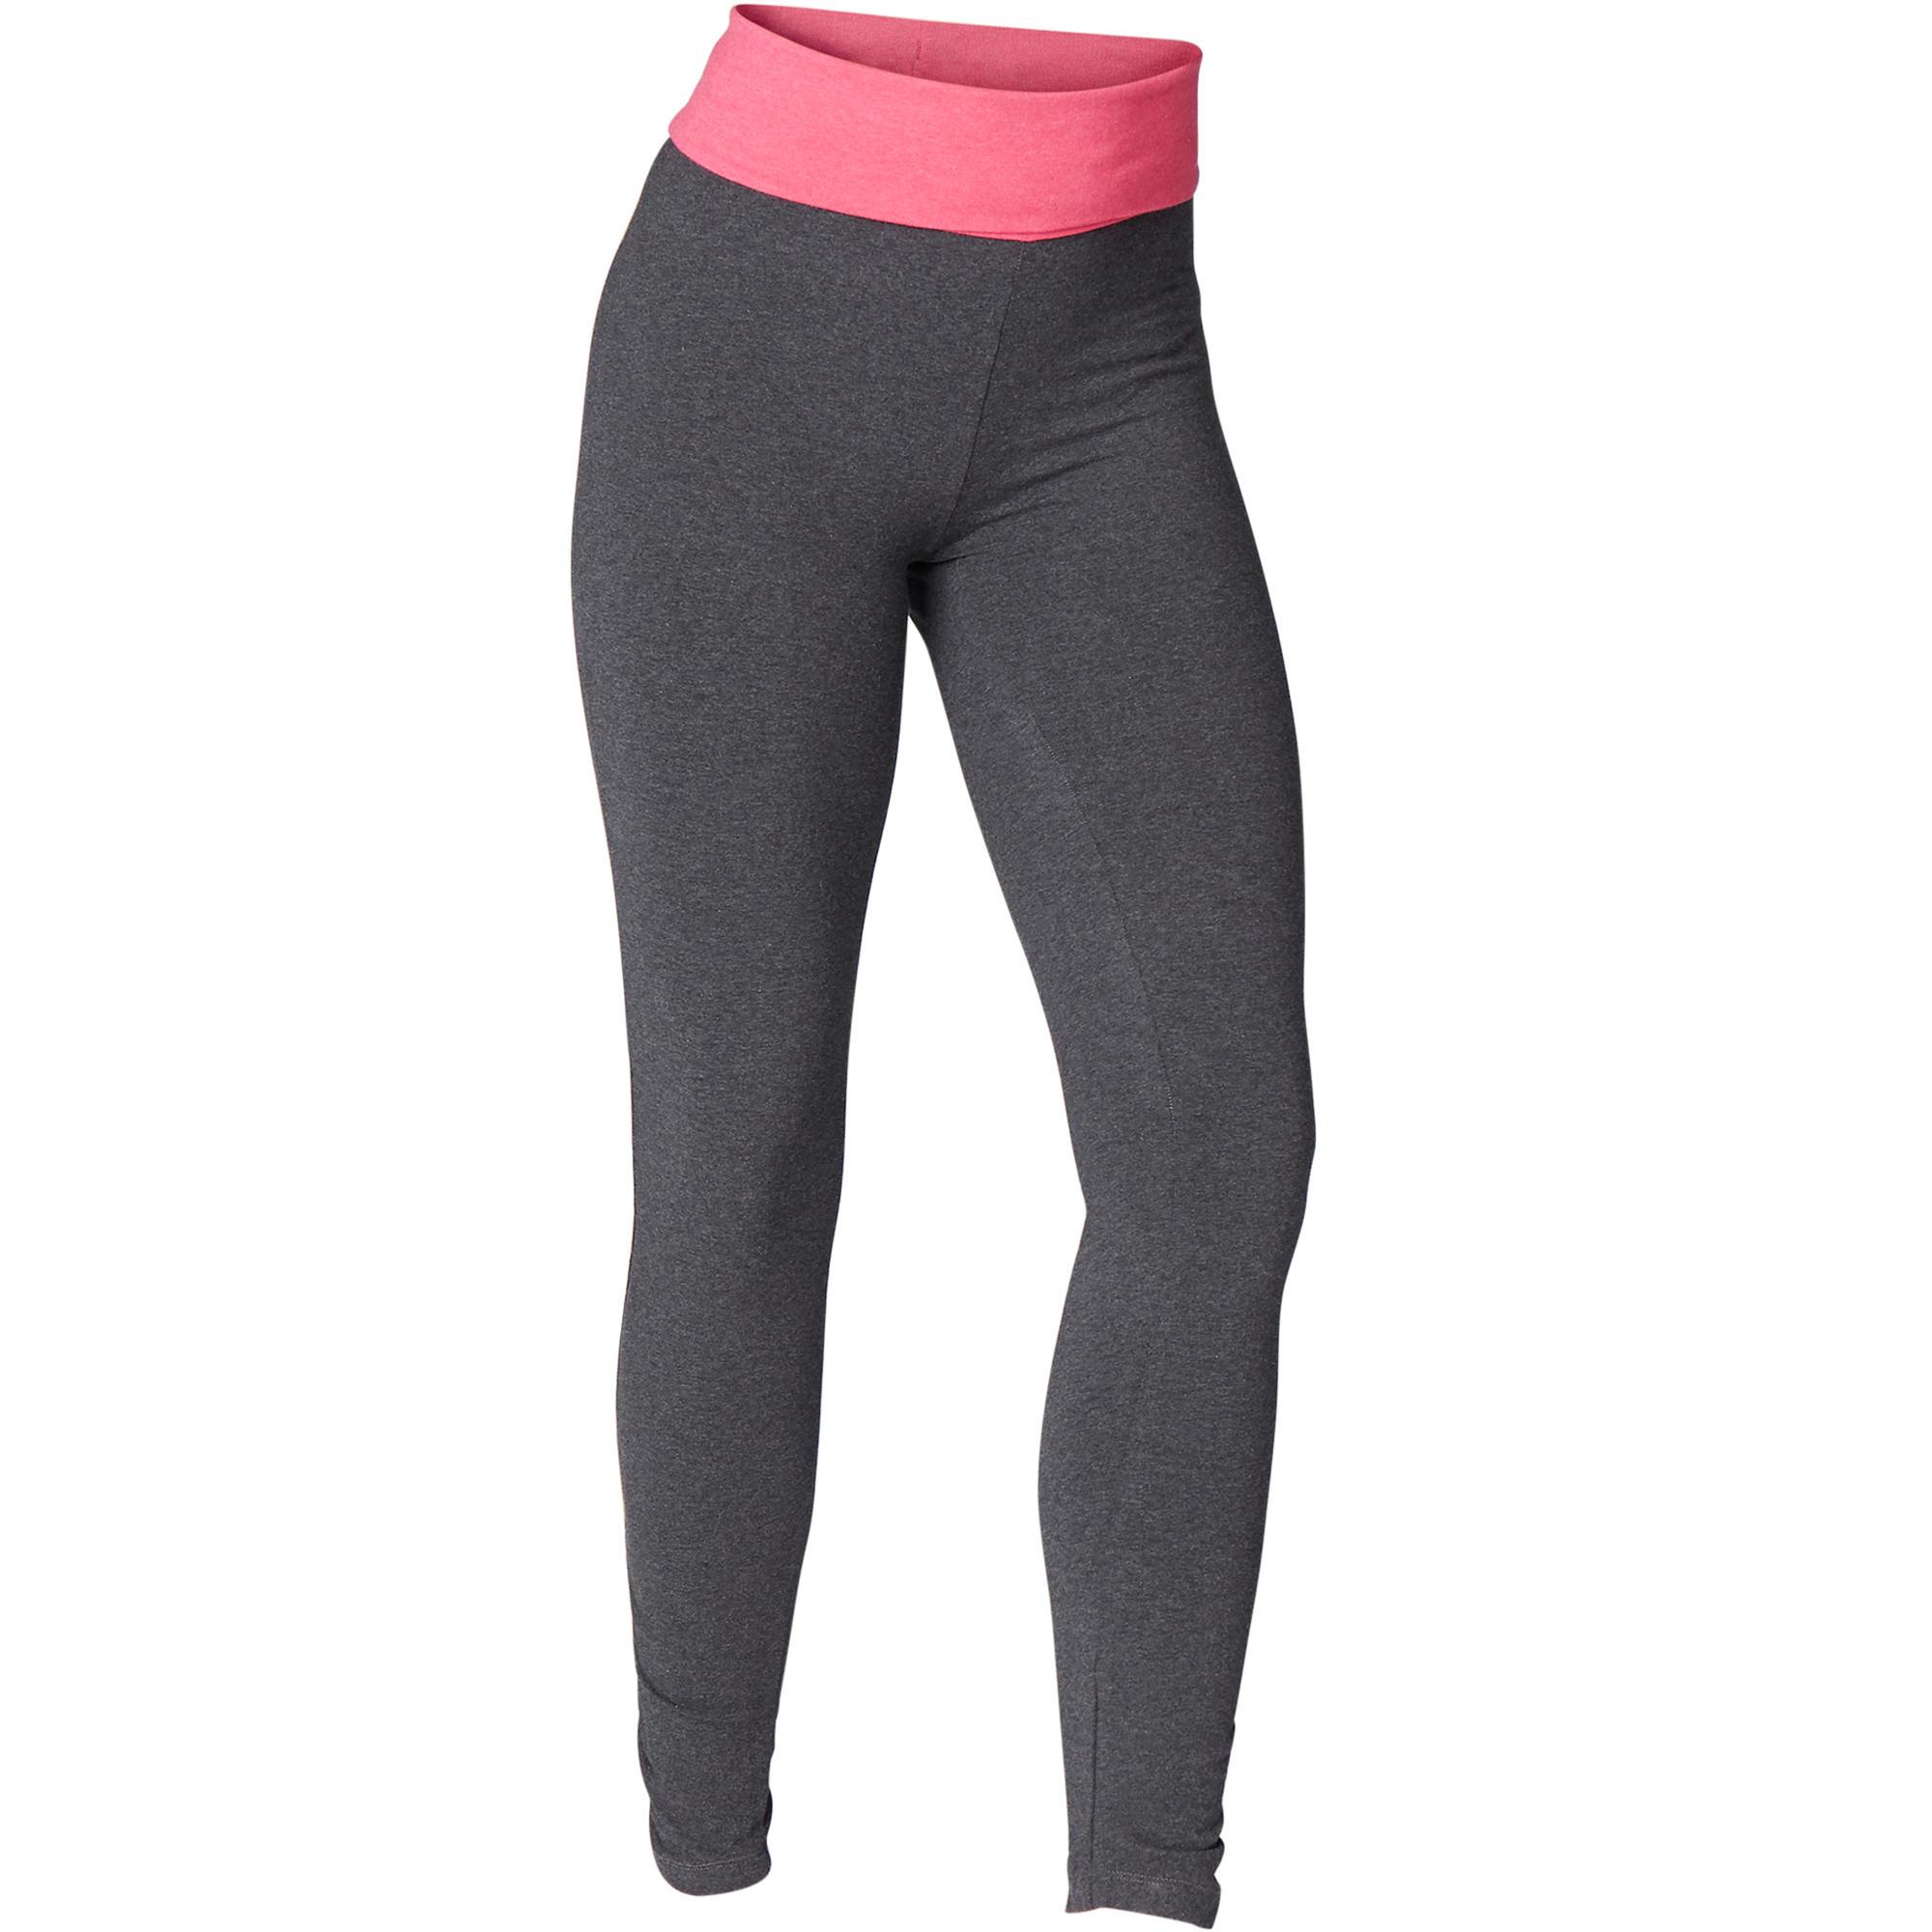 Women's Organic Cotton Gentle Yoga Leggings